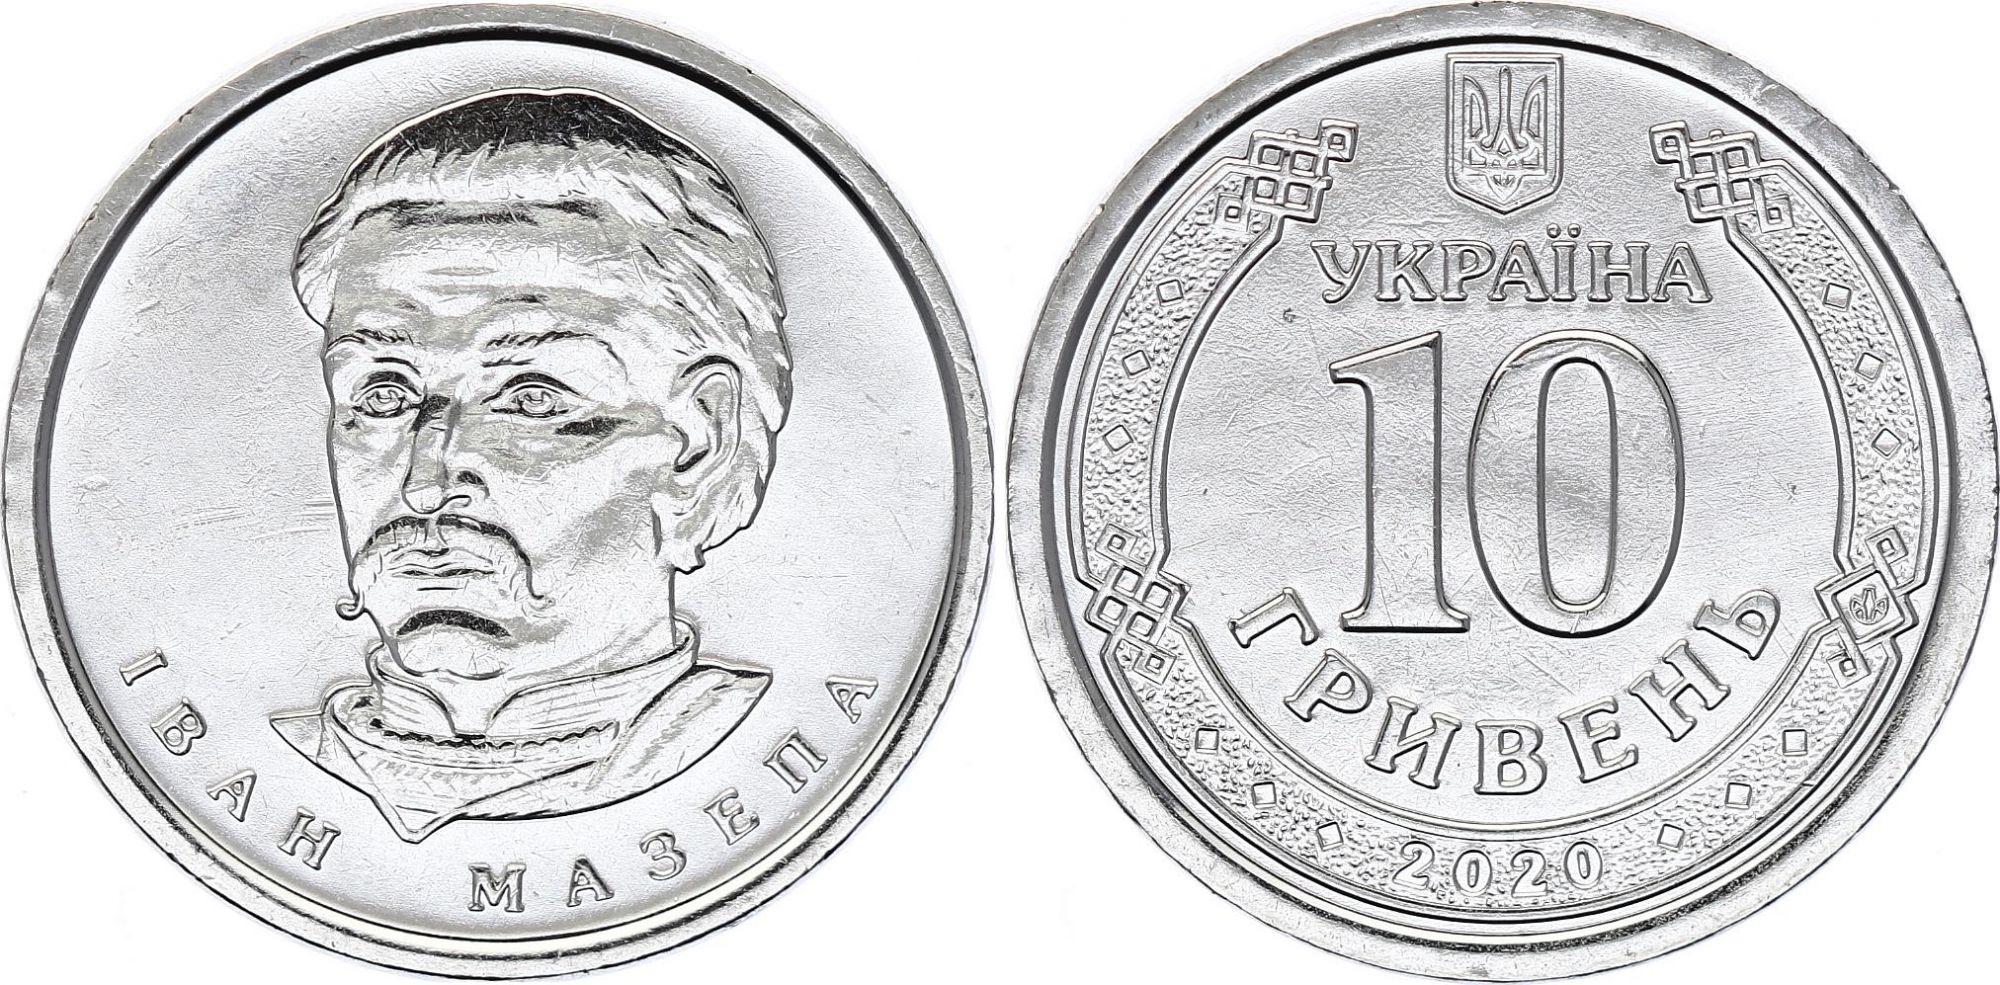 Ukraine 10 Hryven Ivan Mazepa - 2020